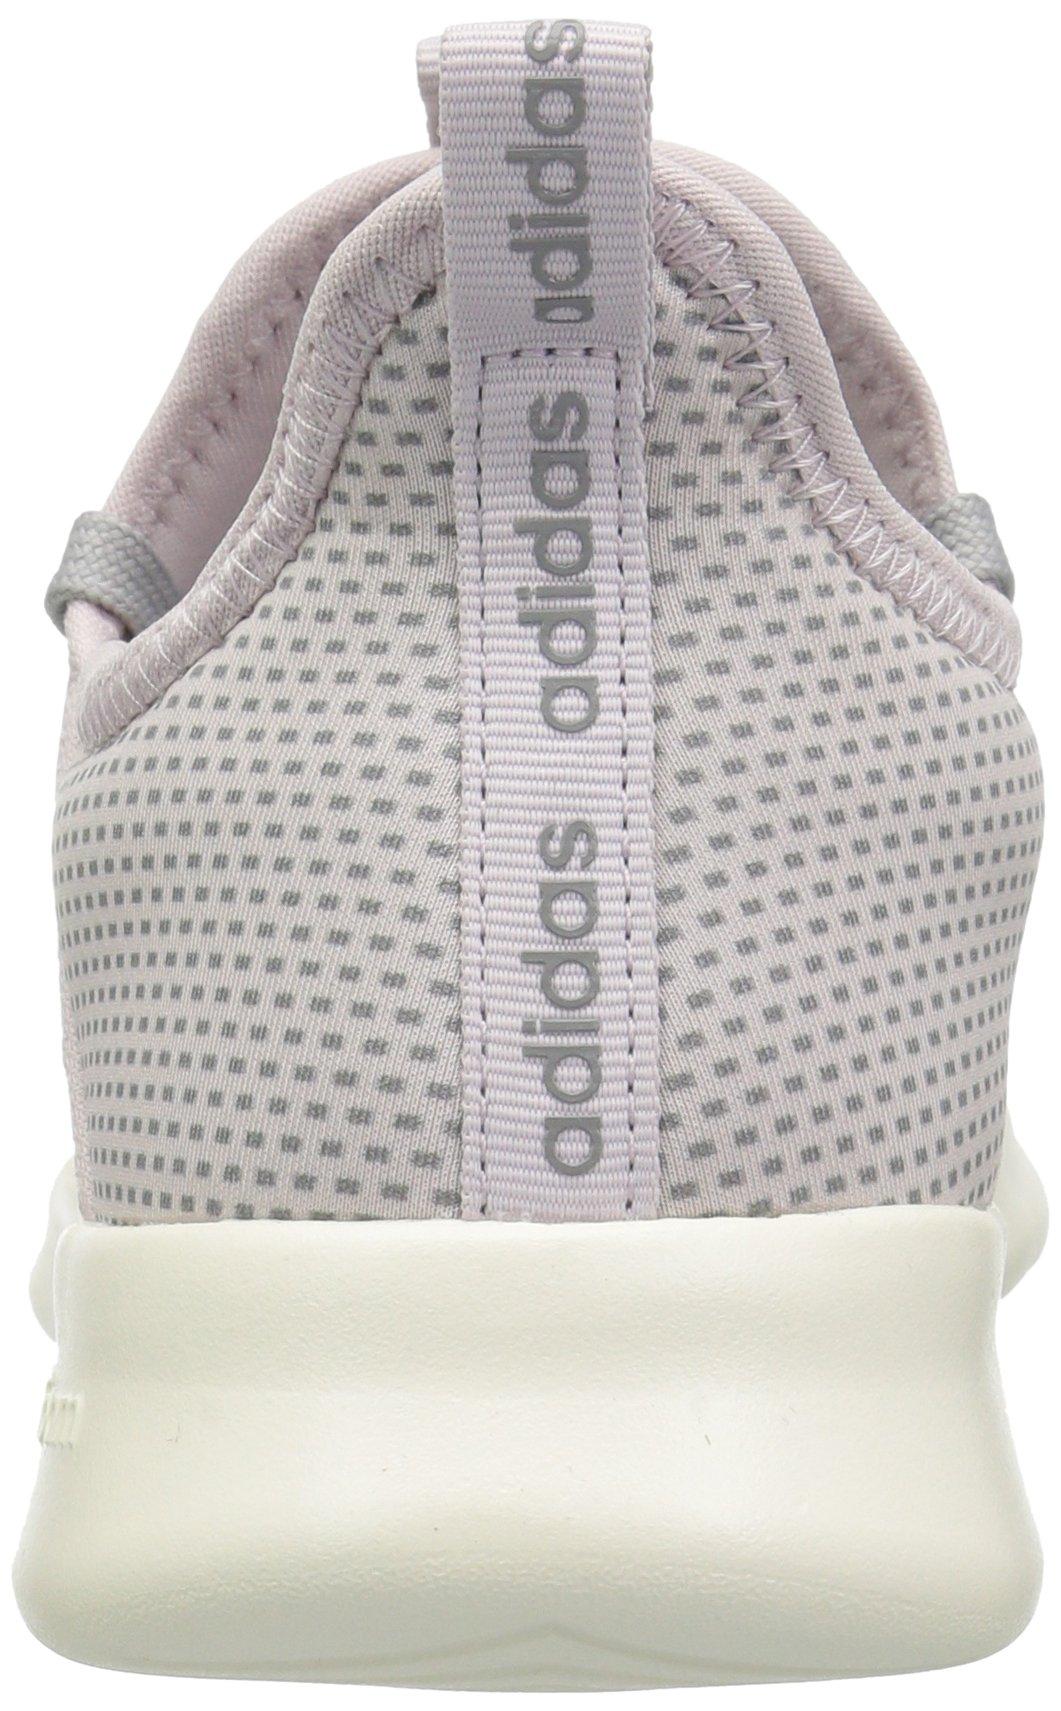 adidas Performance Women's Cloudfoam Pure Running Shoe, Ice Purple/Grey/White, 5 M US by adidas (Image #2)